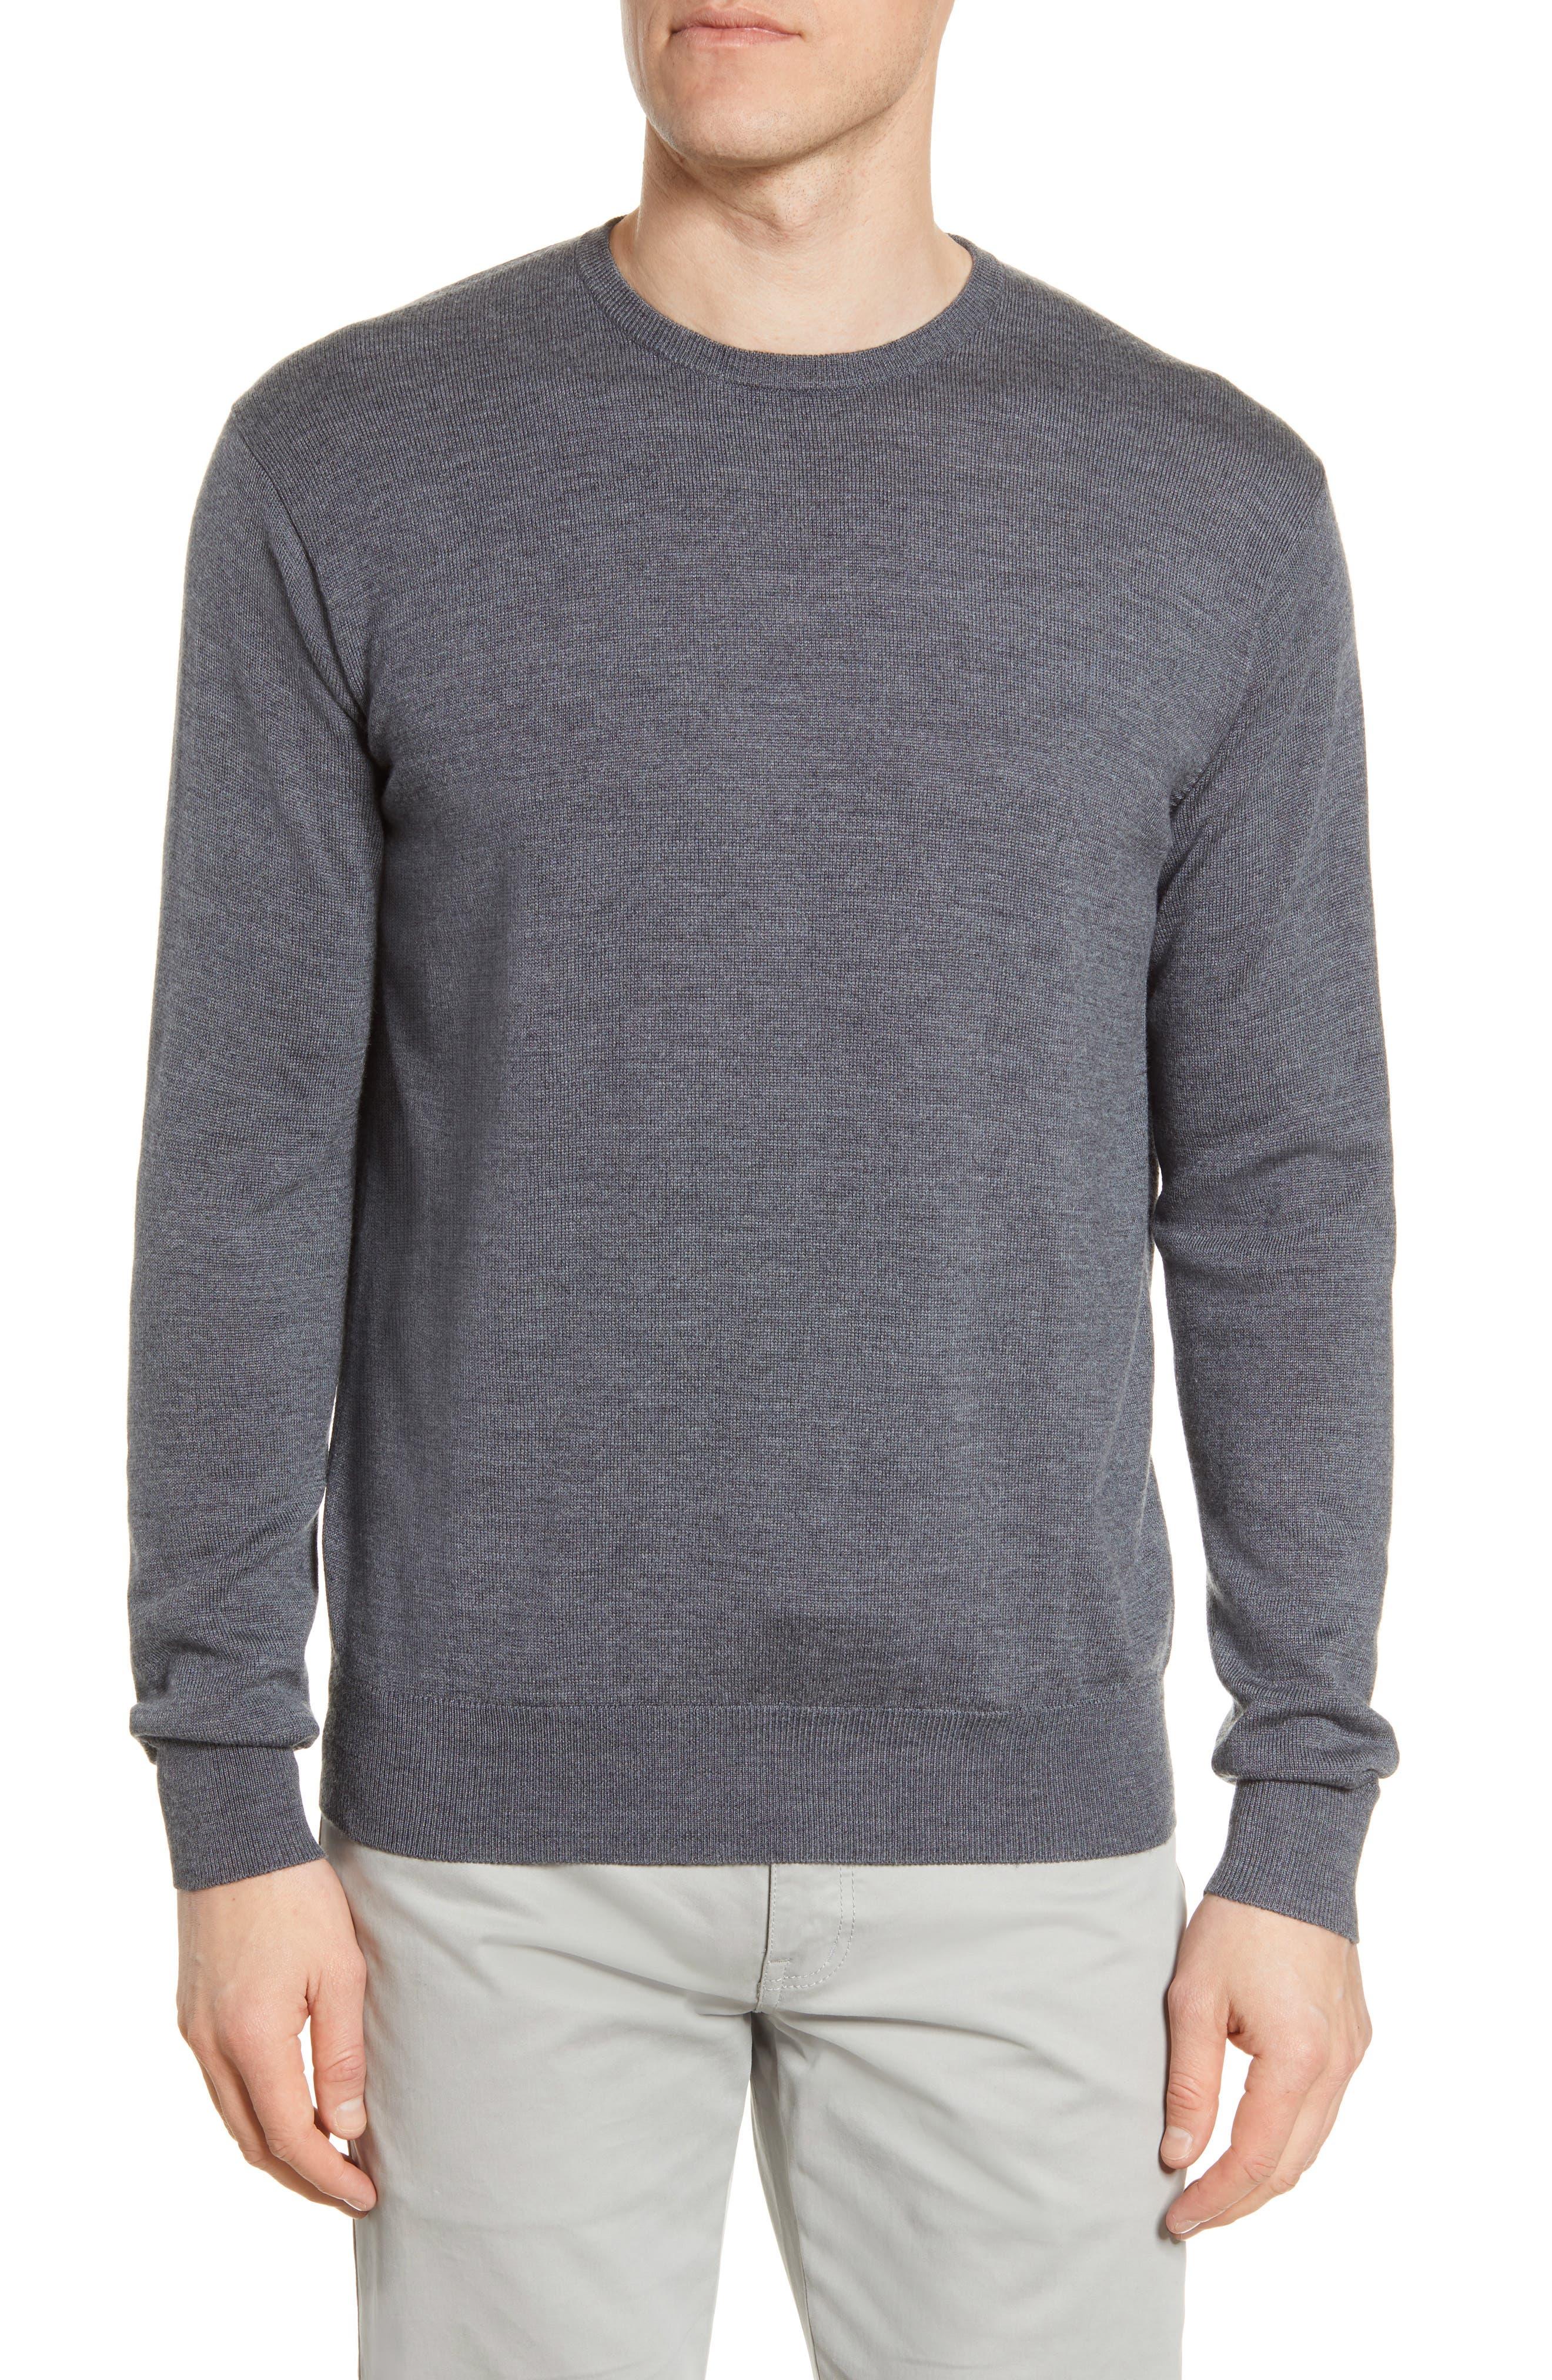 Mens Striped Sweater Cotton Jumper Brand S.OLIVER 100/% Cotton Mens Marine Pullover Stripy Pullover Blue   White 3XL Size